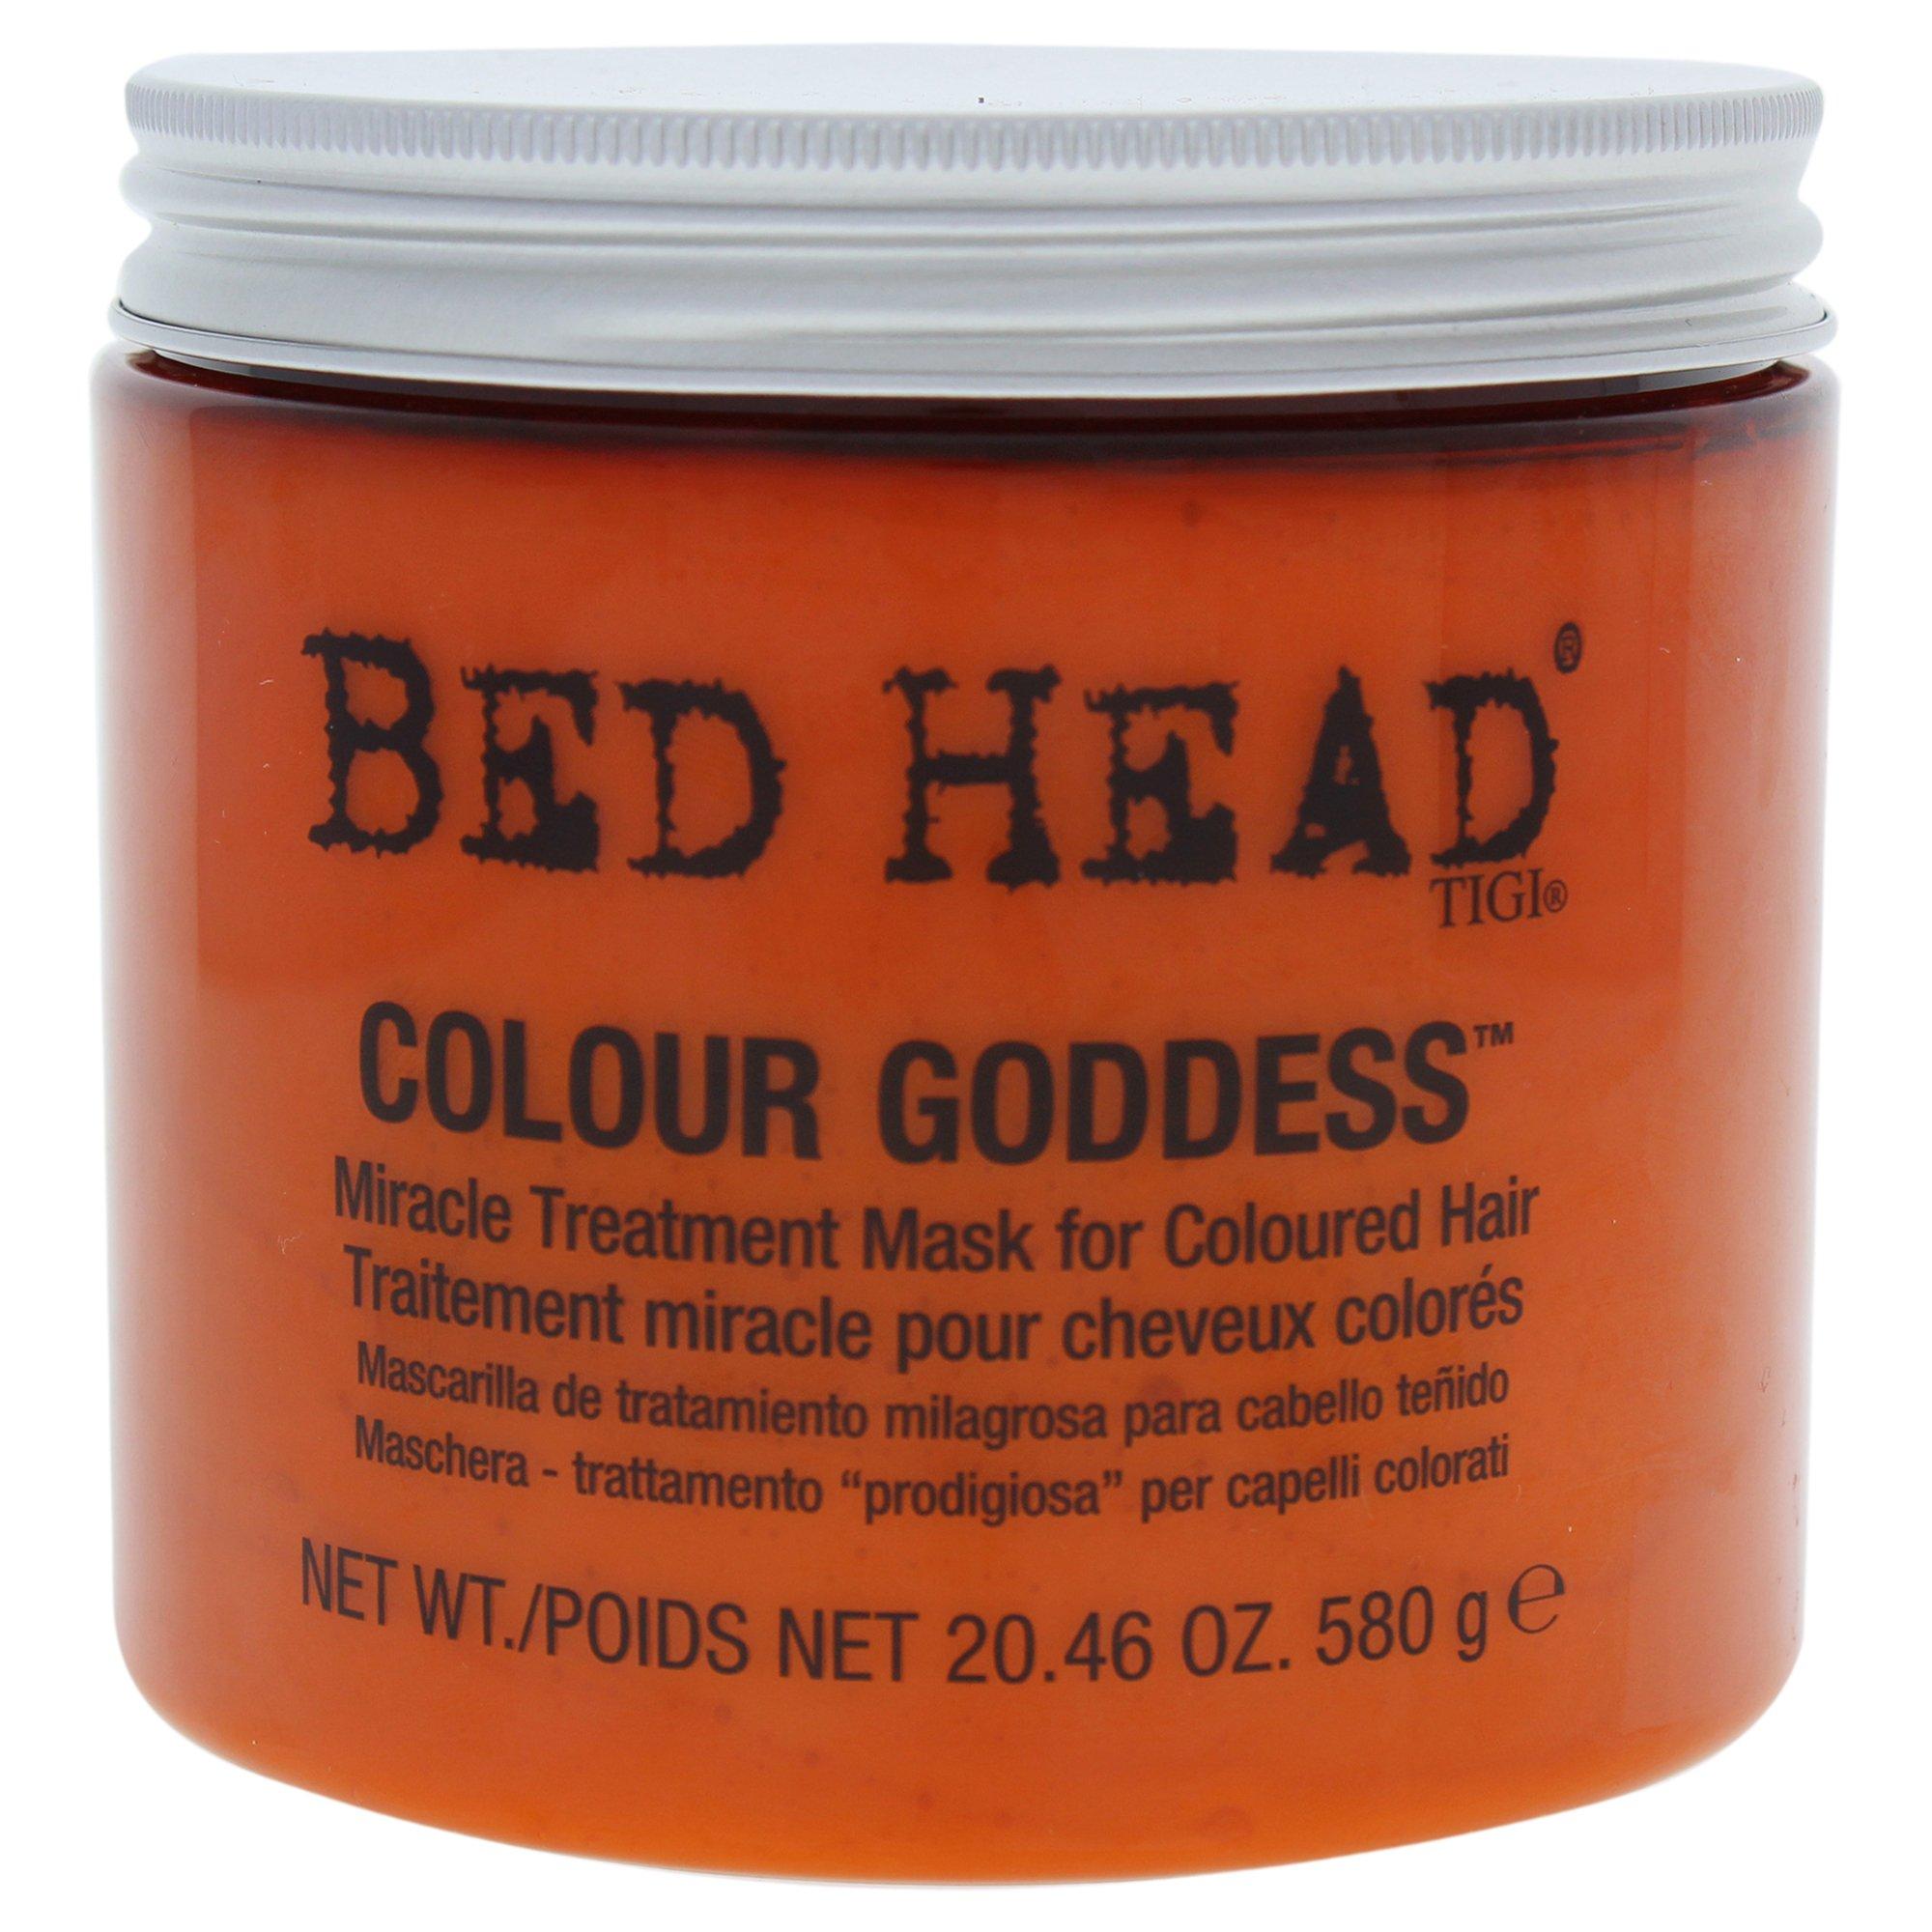 Bead Head Tigi Bed Head Colour Goddess Miracle Treatment Mask, 20.46 Ounce